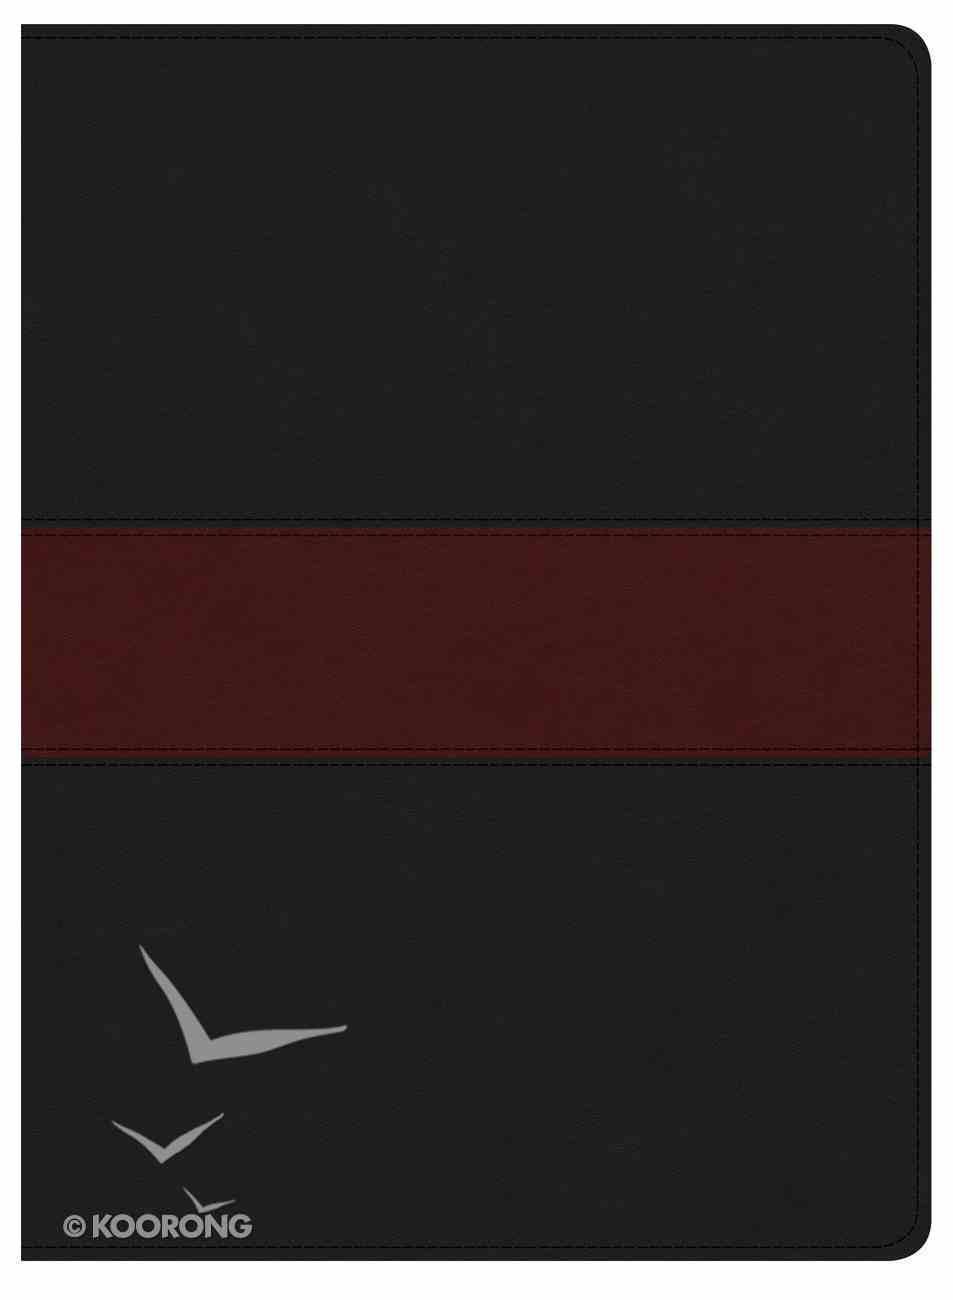 KJV Apologetics Study Bible Black/Red Indexed (Black Letter Edition) Imitation Leather